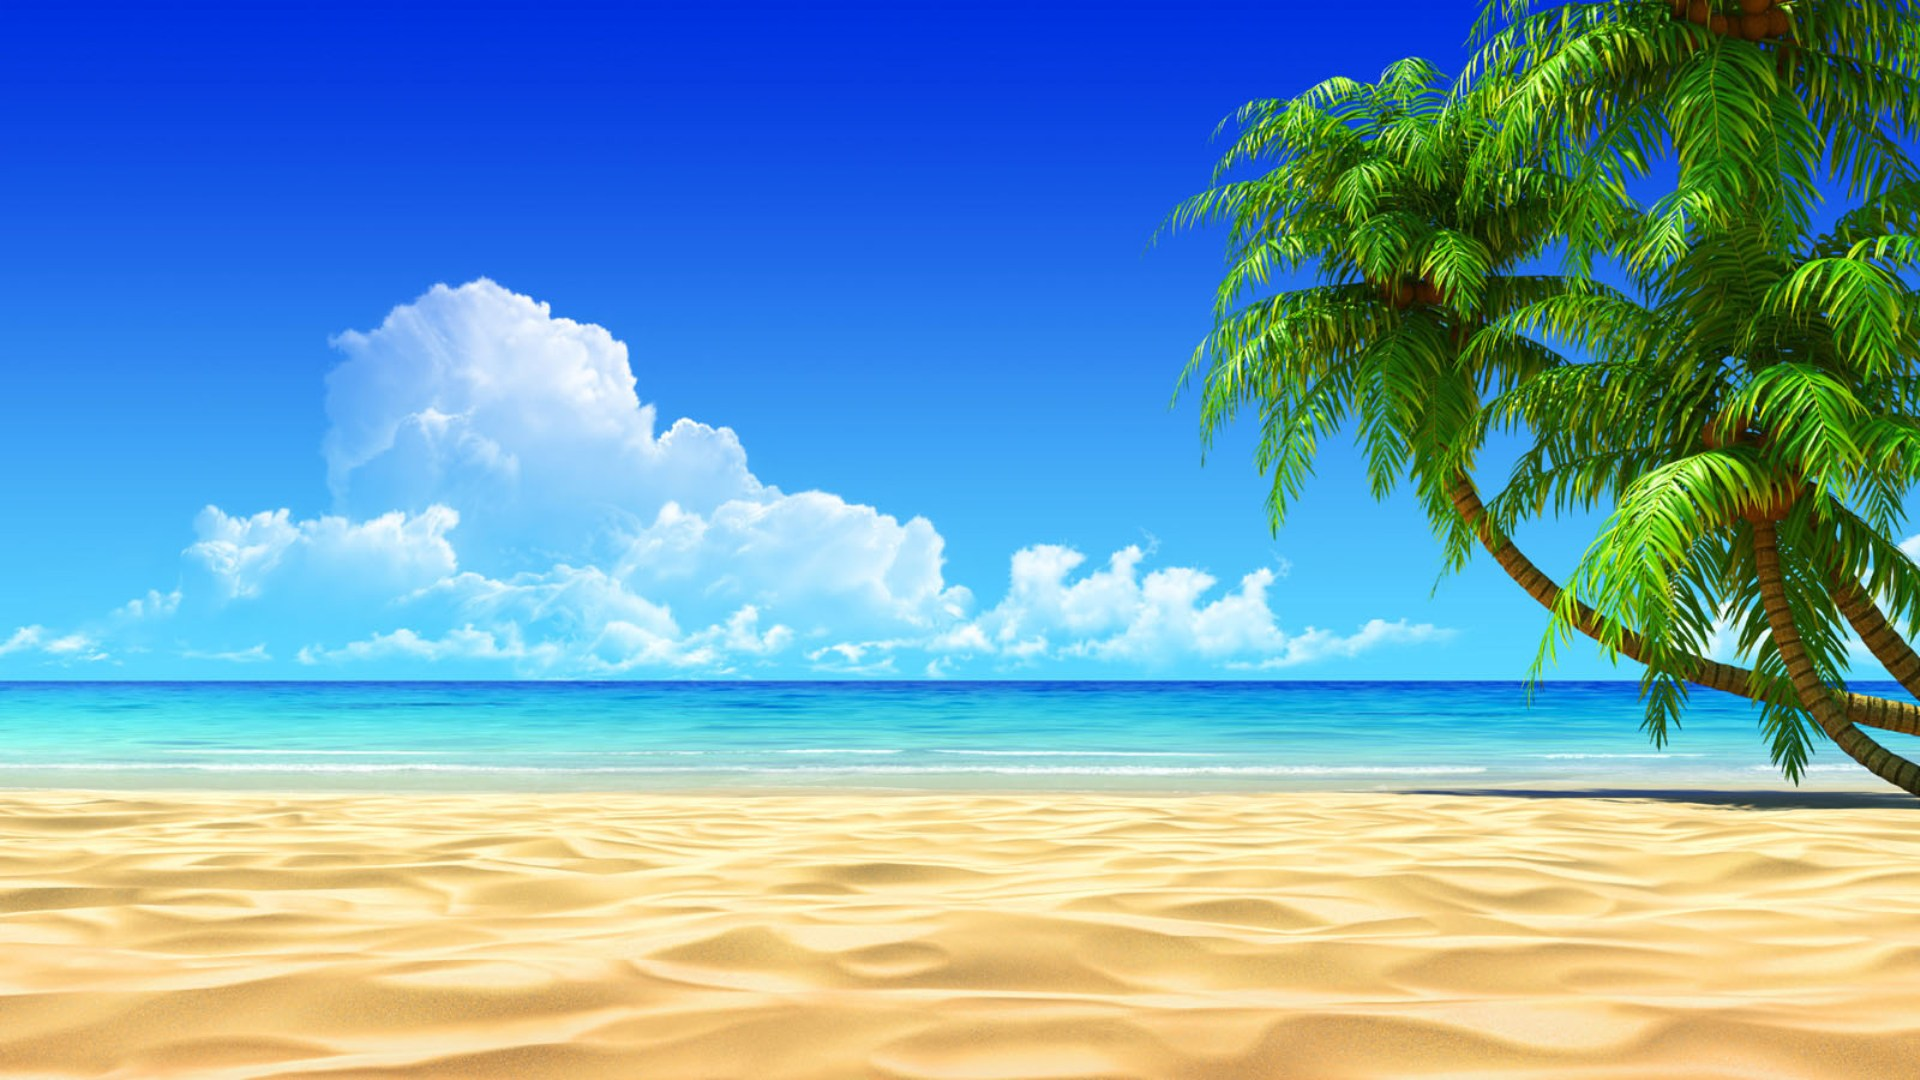 Free download Beach Screensavers wallpaper 1920x1080 6746 ...